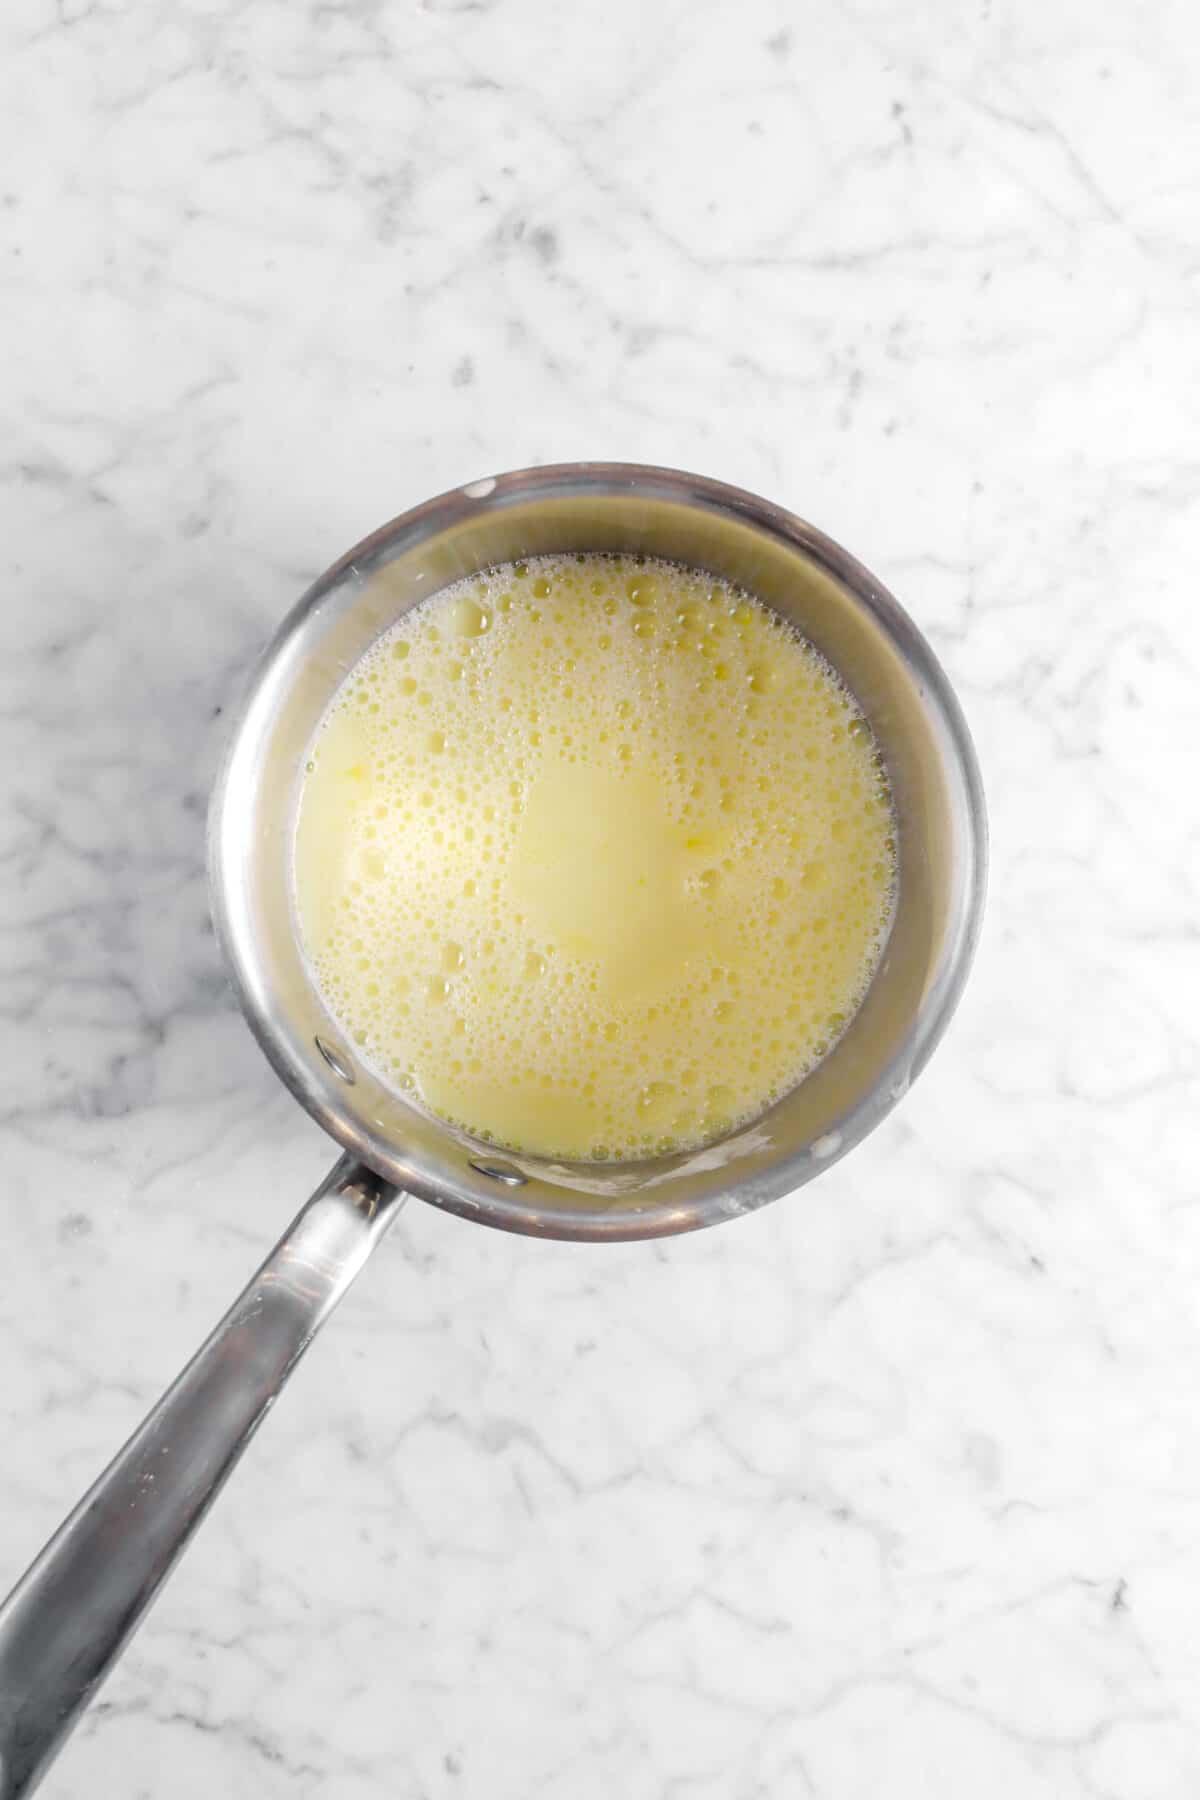 egg yolk mixture in small pot